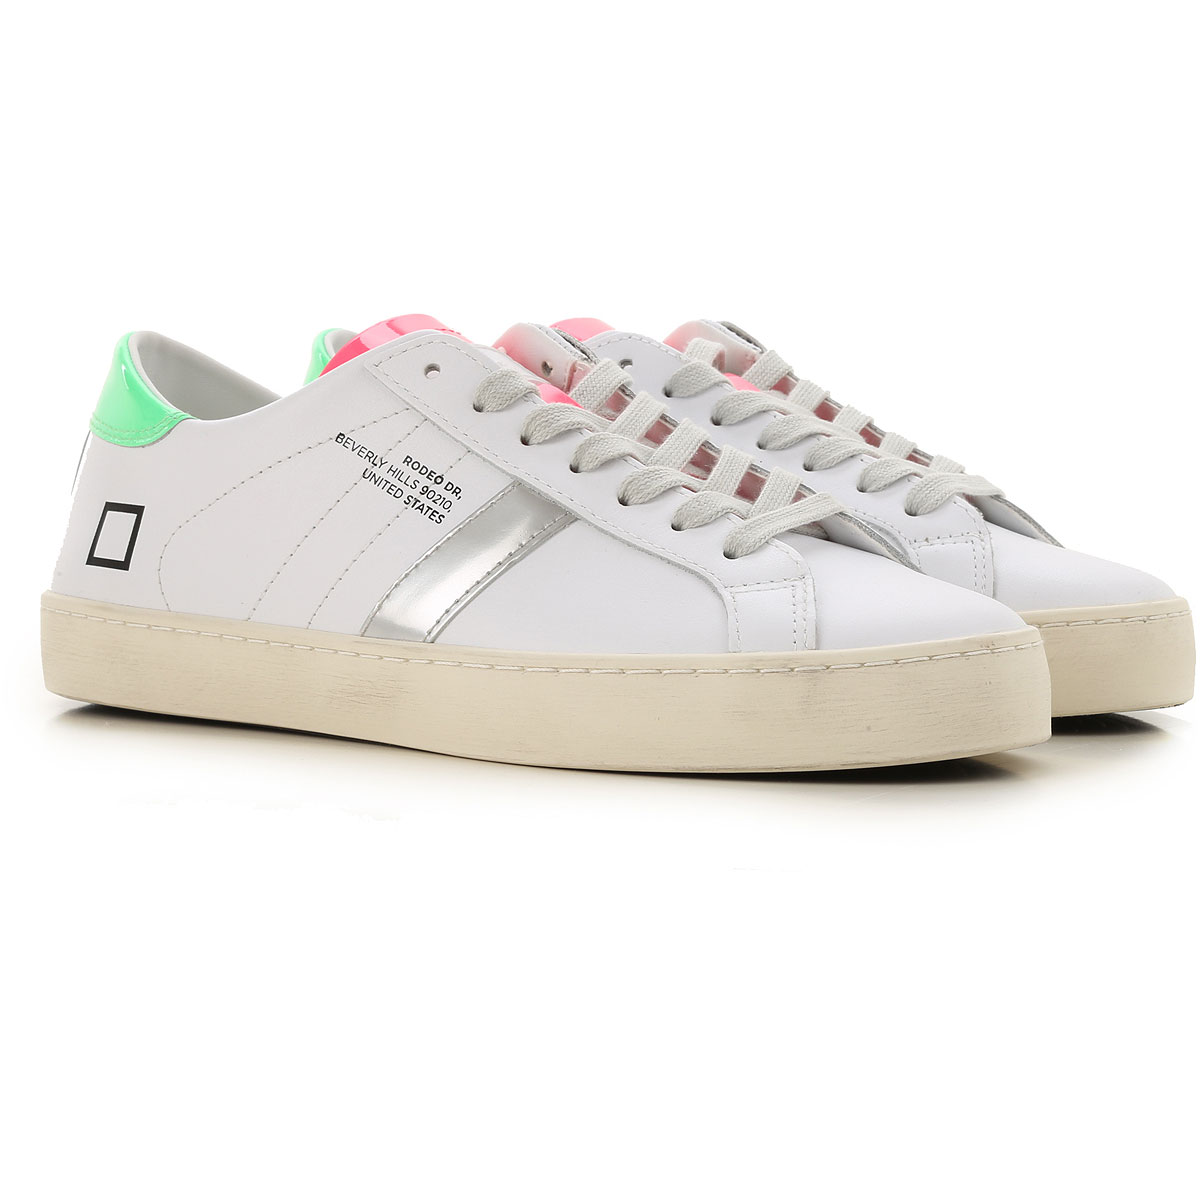 D.A.T.E. Sneakers for Women On Sale, White, Leather, 2019, US 8 5 - UK 6 - EU 39 - JP 25 US 7 5 - UK 5 - EU 38 - JP 24